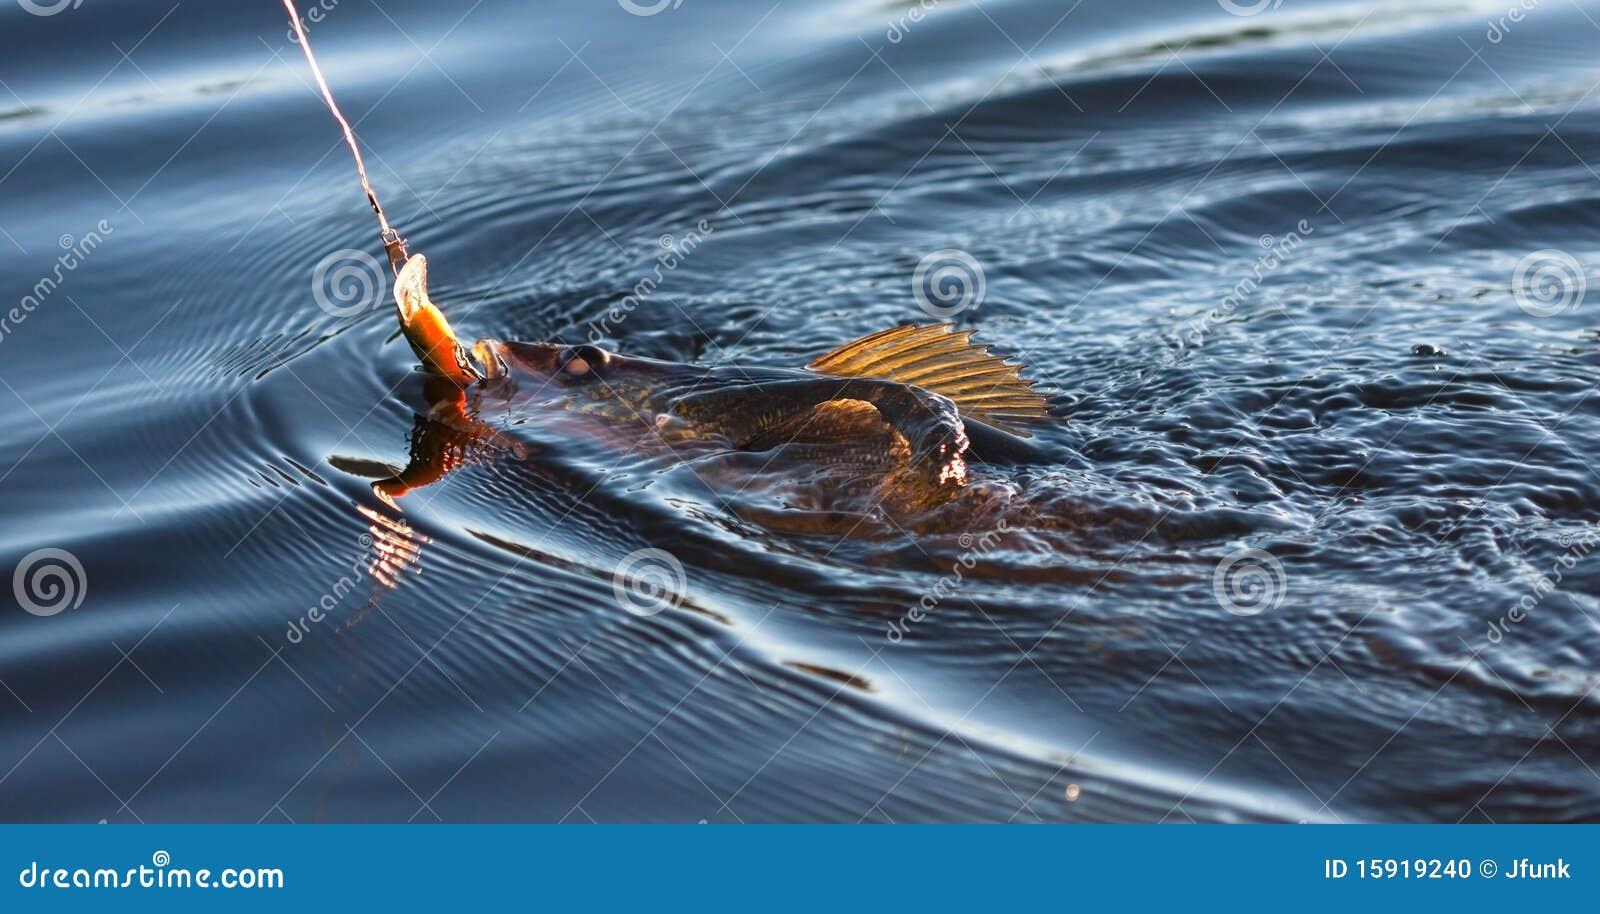 Fishing for Pickerel